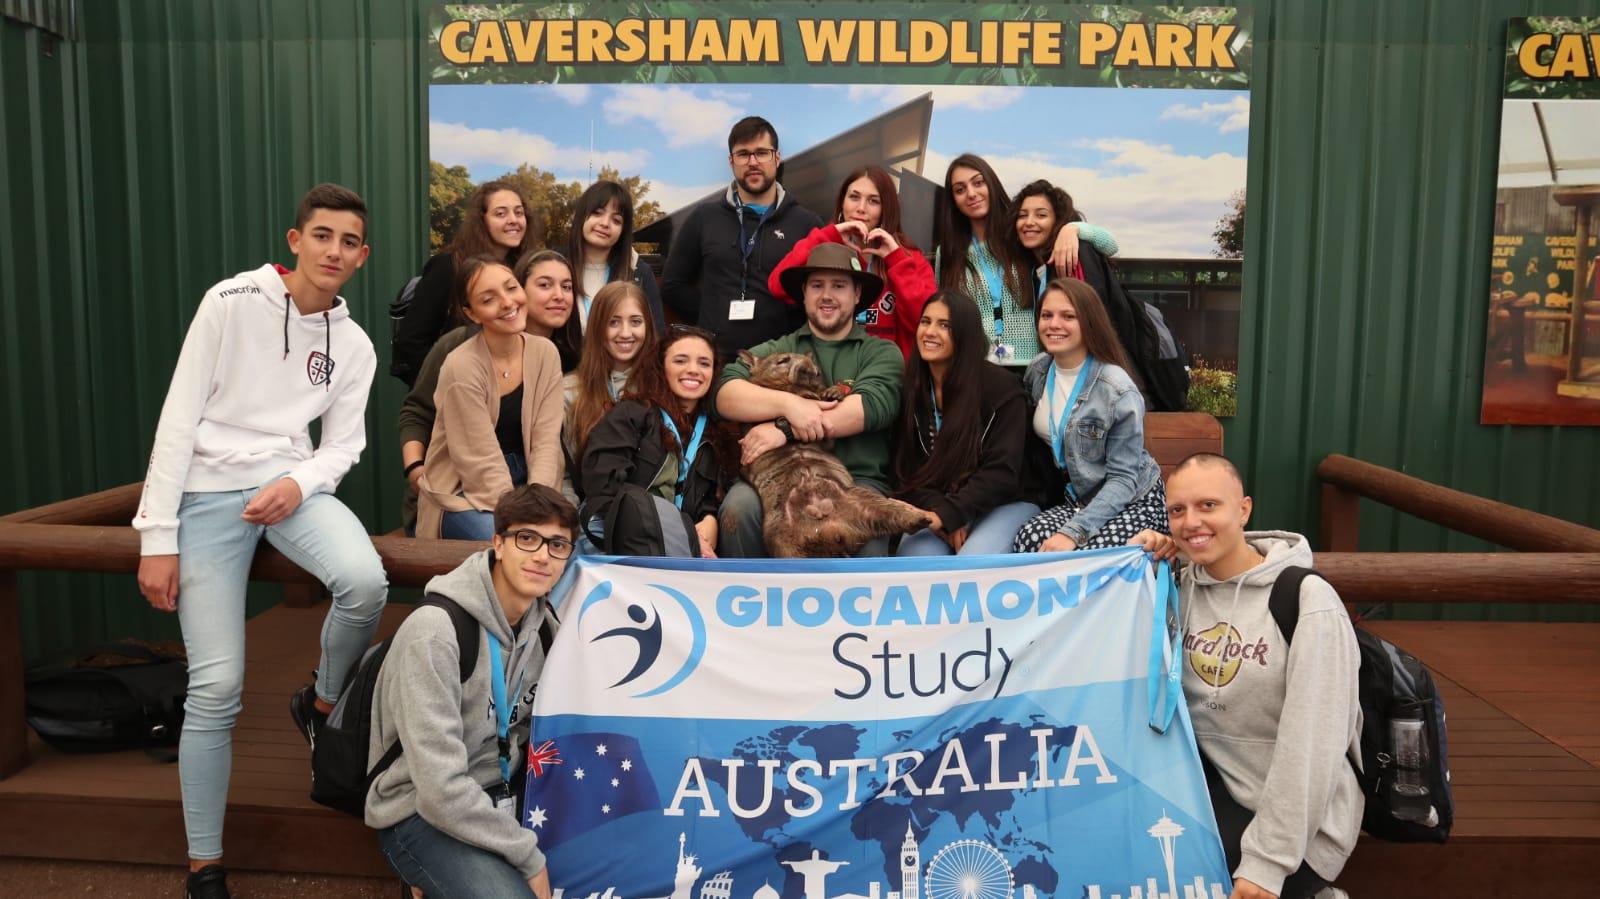 Australia Archivi - Giocamondo Study-IMG-20190720-WA0174